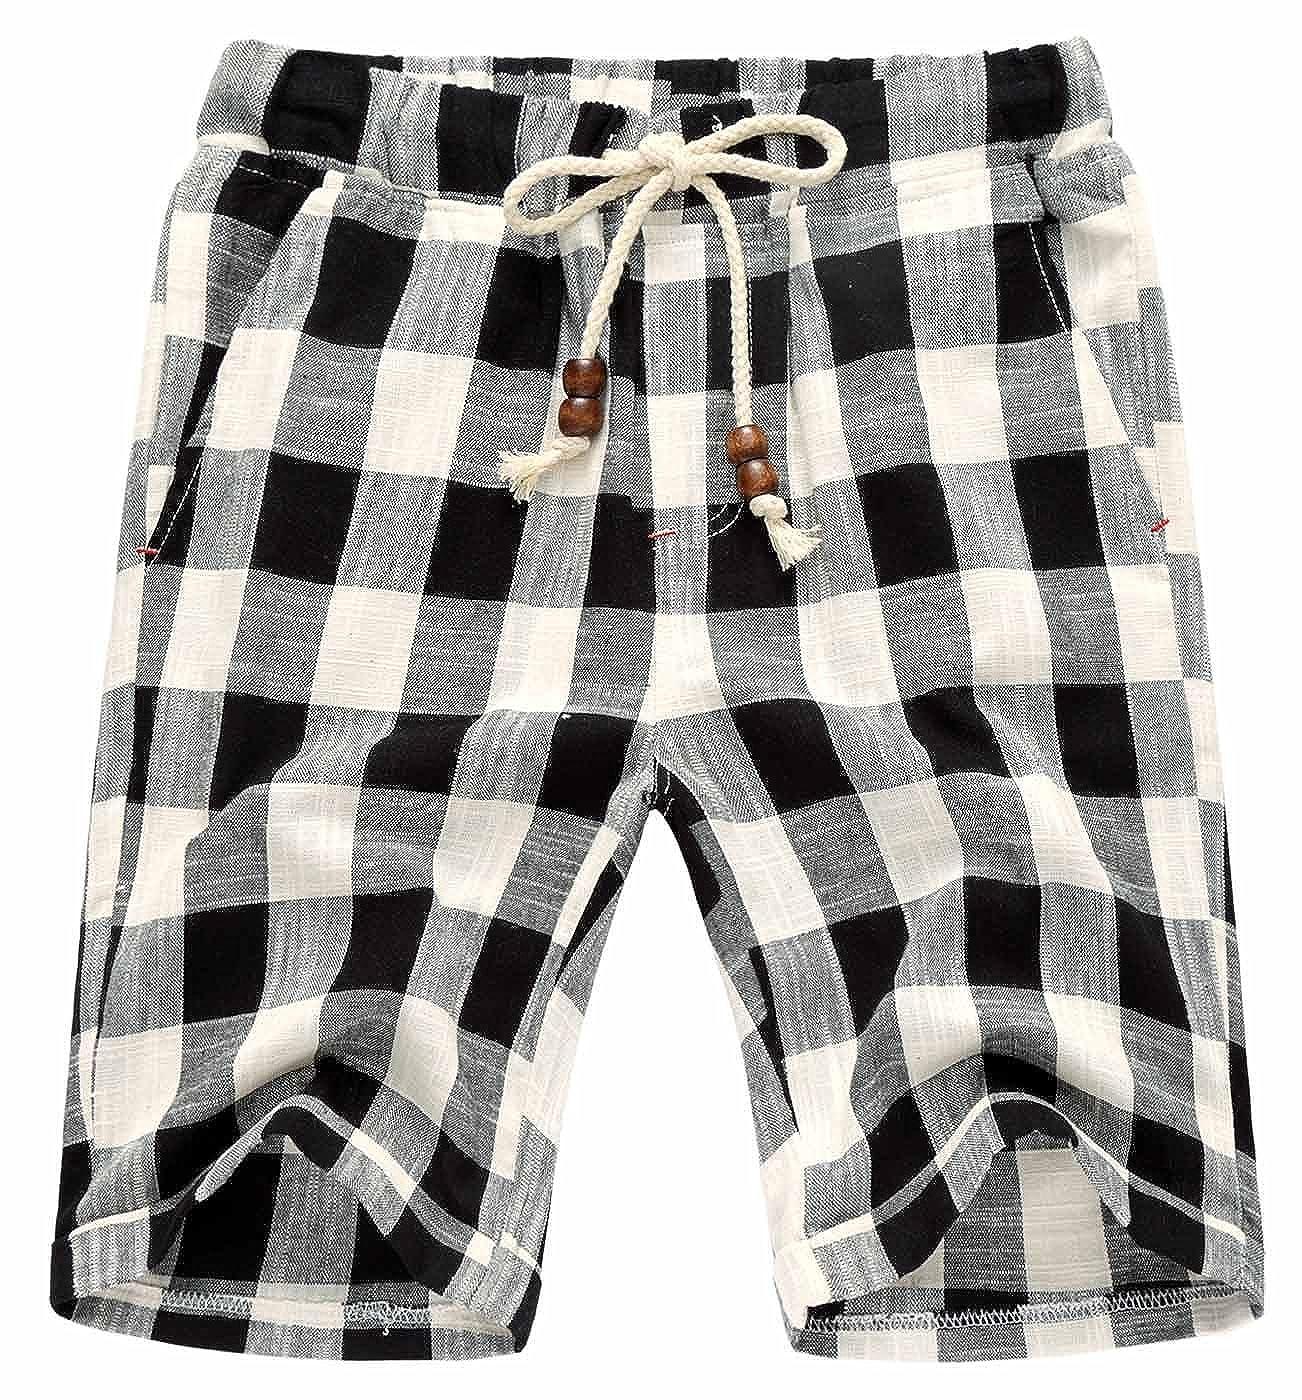 AIEOE Men Linen Shorts Drawstring Hand Pockets Soft Breathable Boardshorts